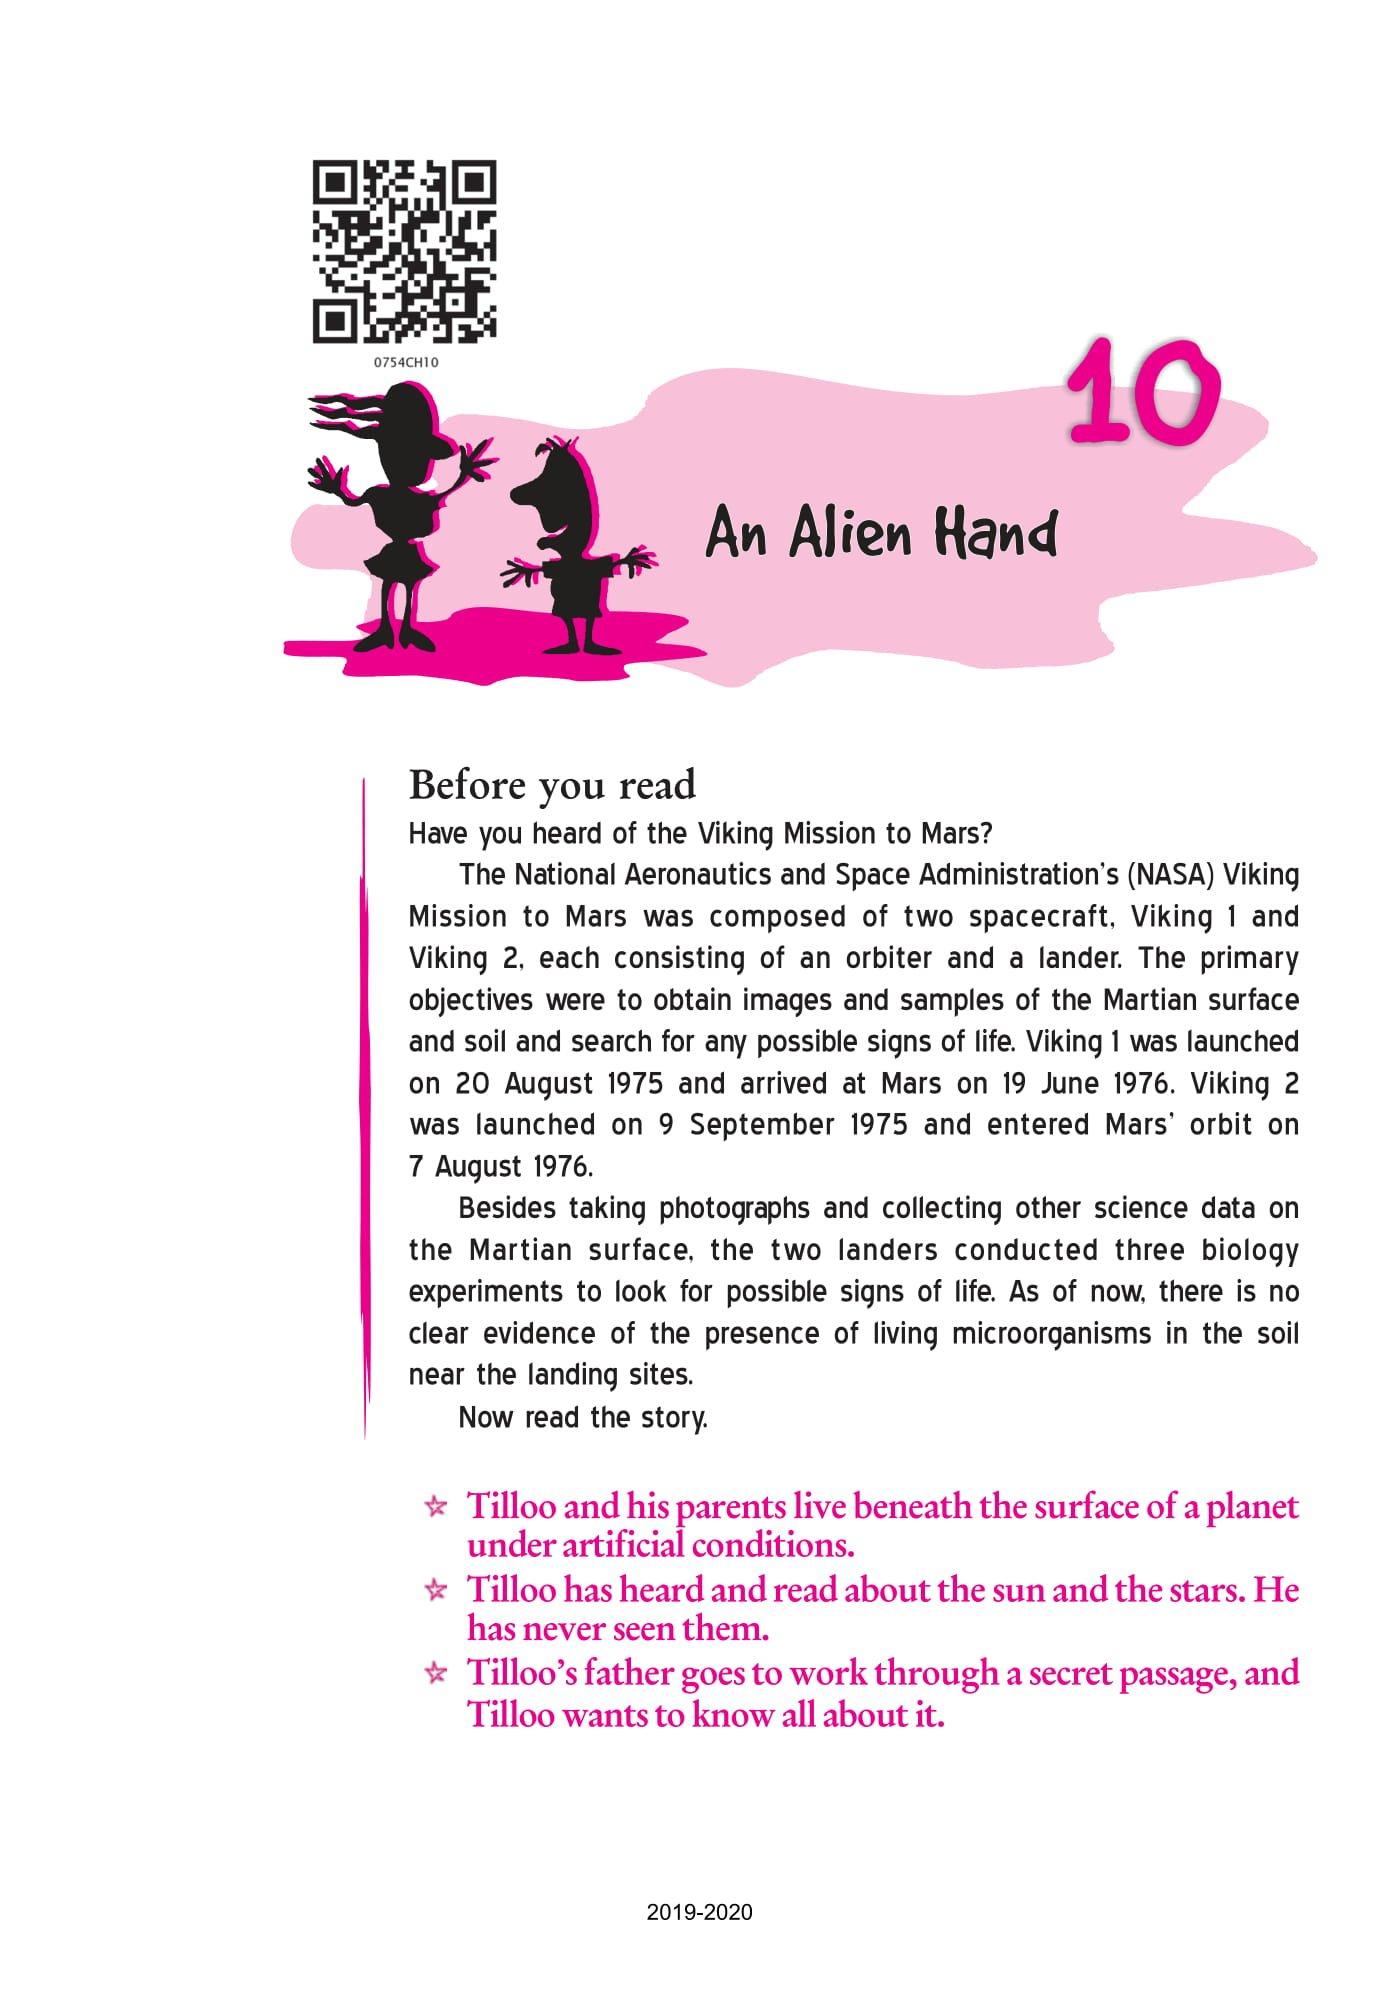 NCERT Book Class 7 English (The Alien Hand) Chapter 10 An Alien Hand - Page 1